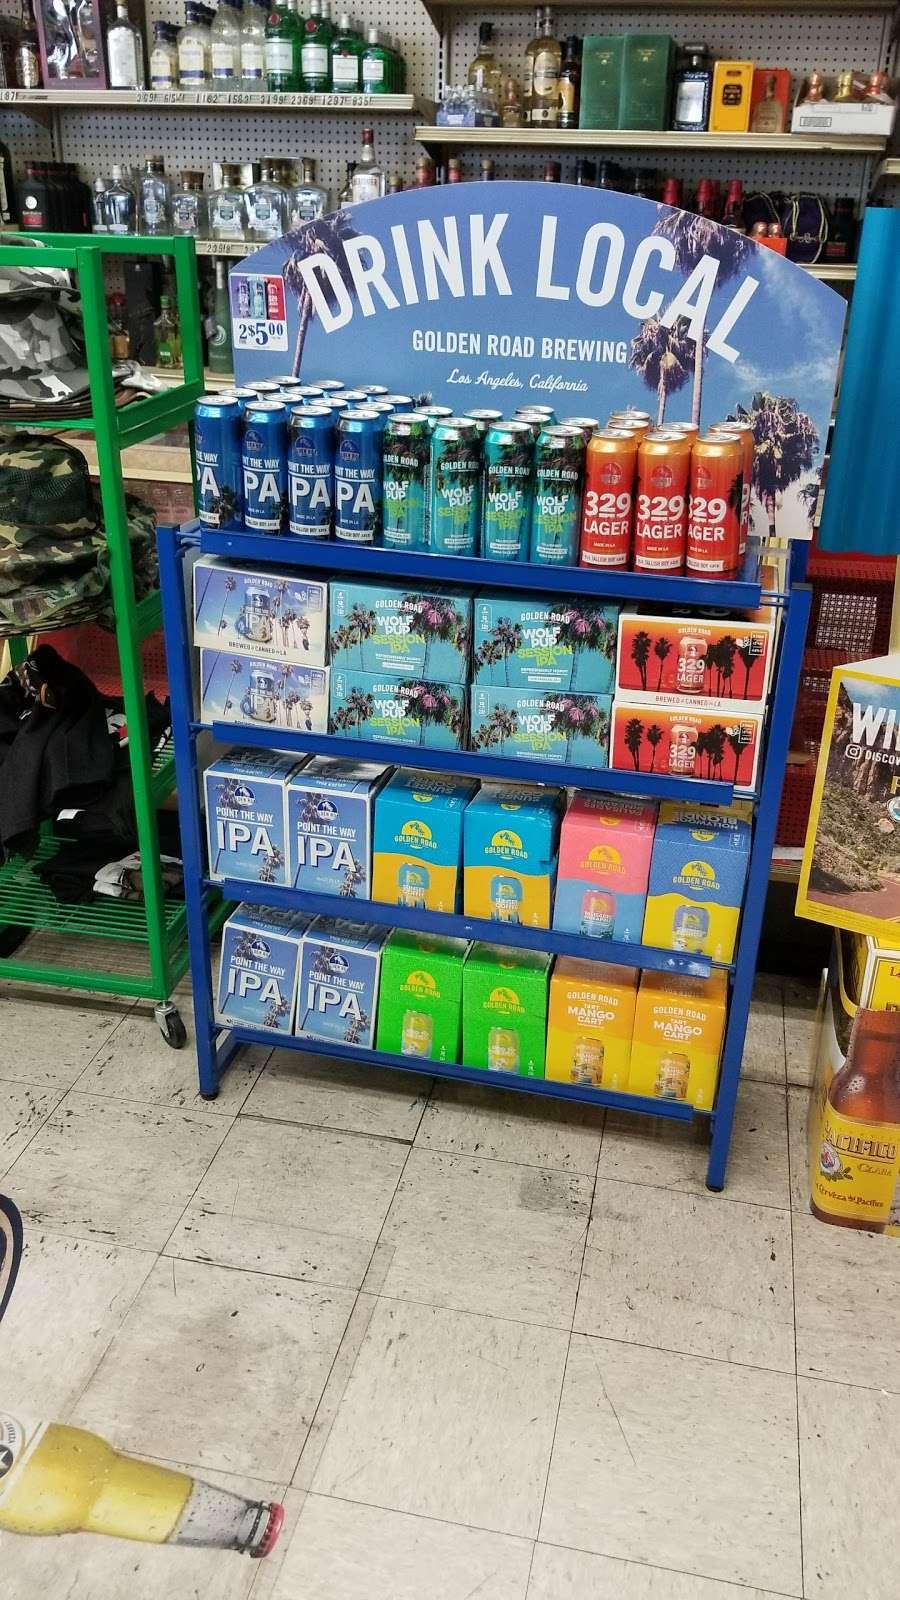 Turf Liquor - store  | Photo 2 of 2 | Address: Whittier, CA 90605, USA